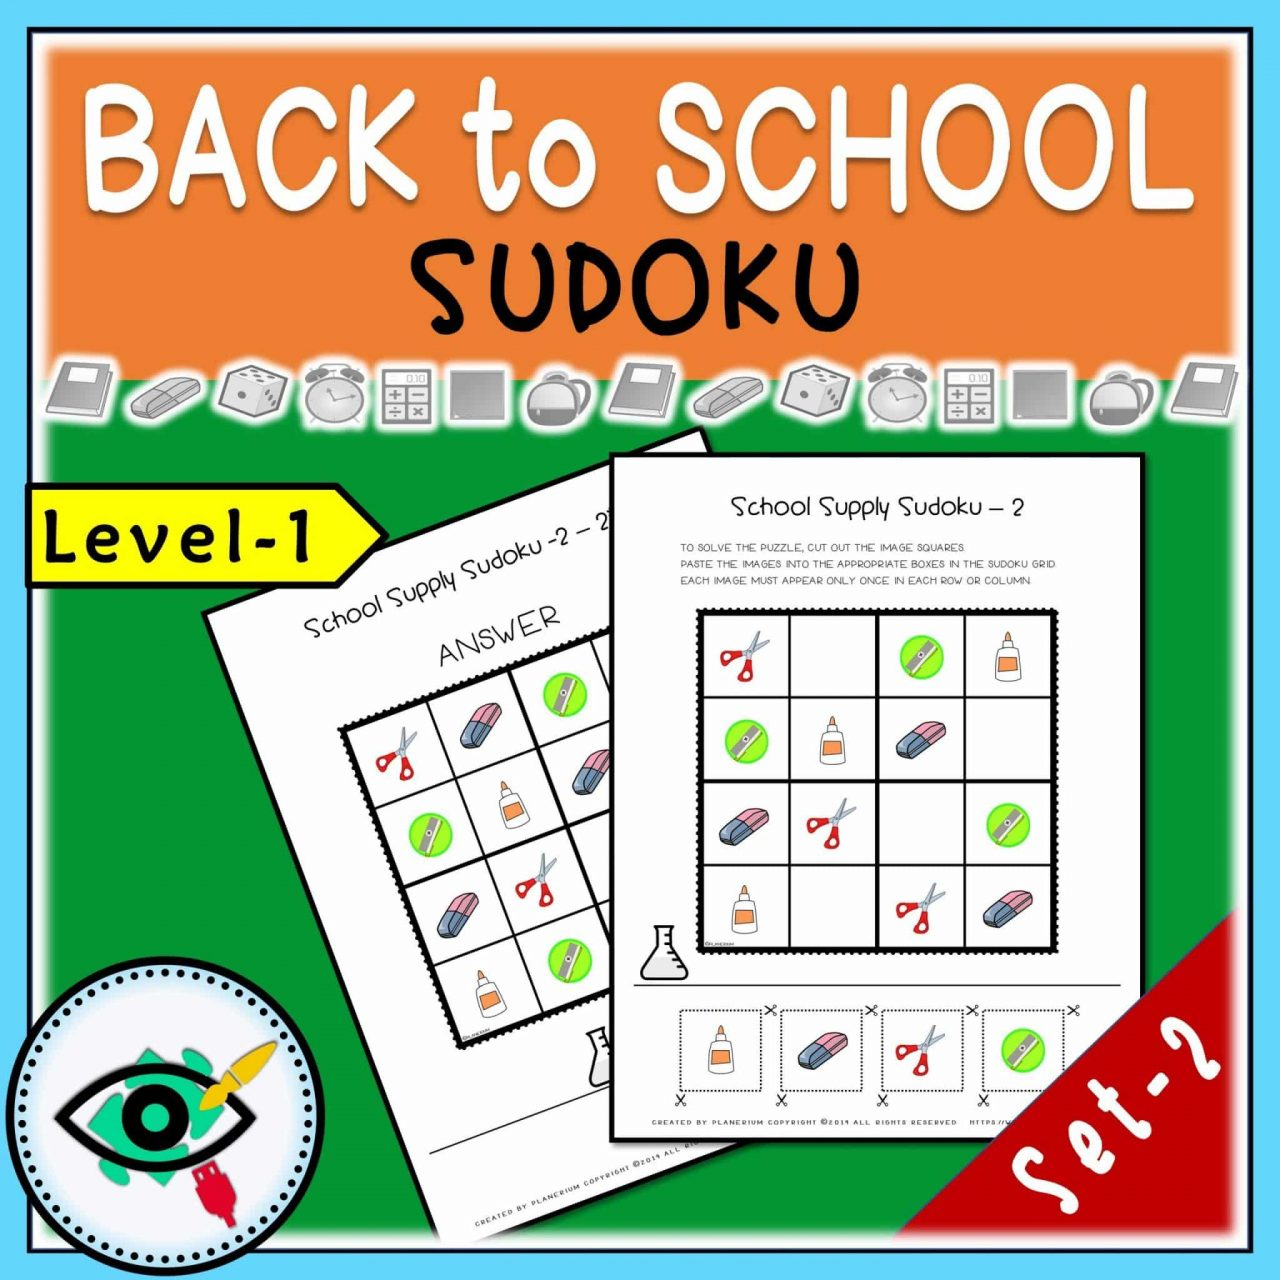 Back to School - Sudoku - Title 4 | Planerium